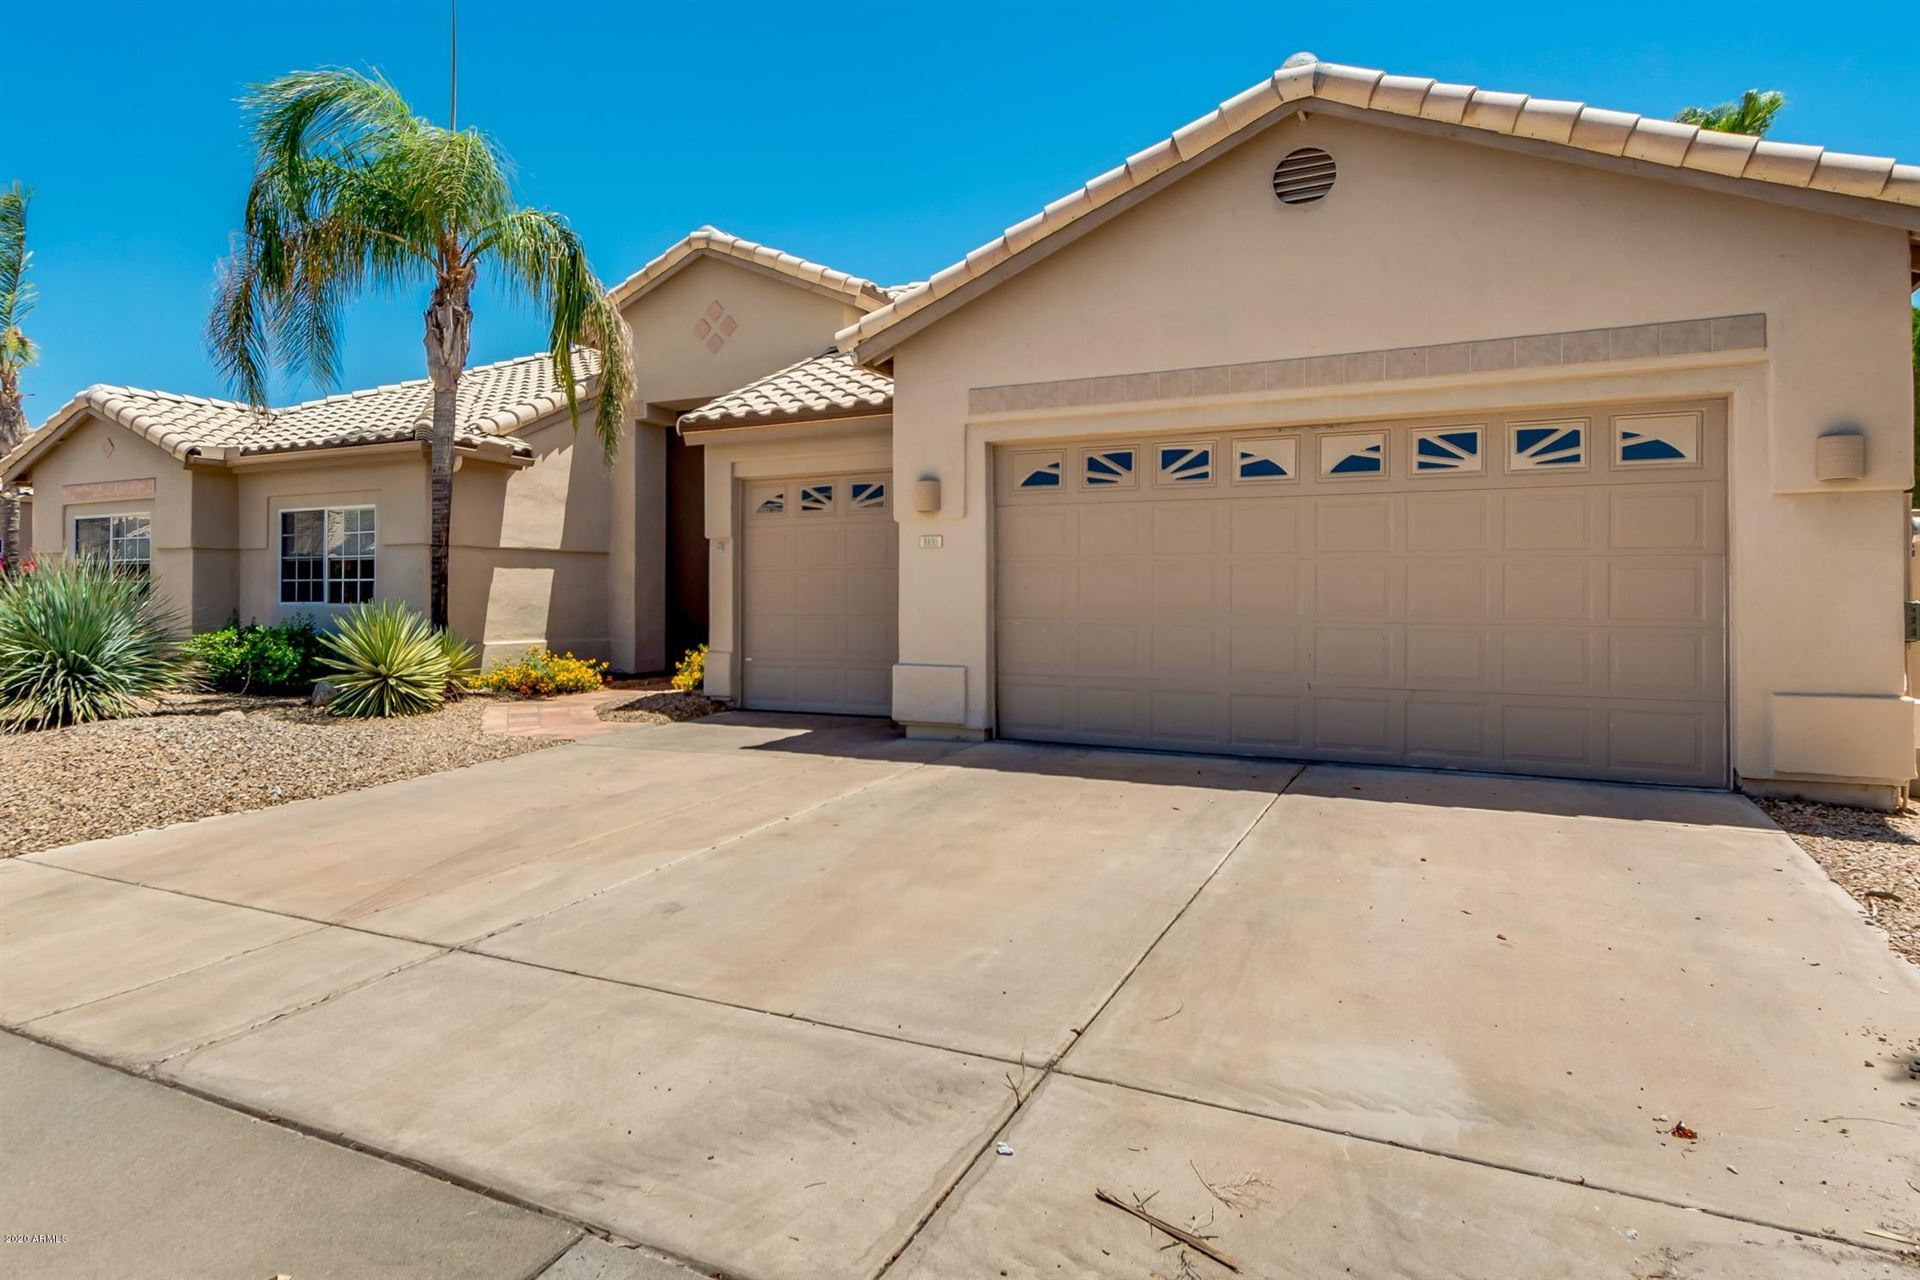 8895 E WOOD Drive, Scottsdale, AZ 85260 - MLS#: 6098648